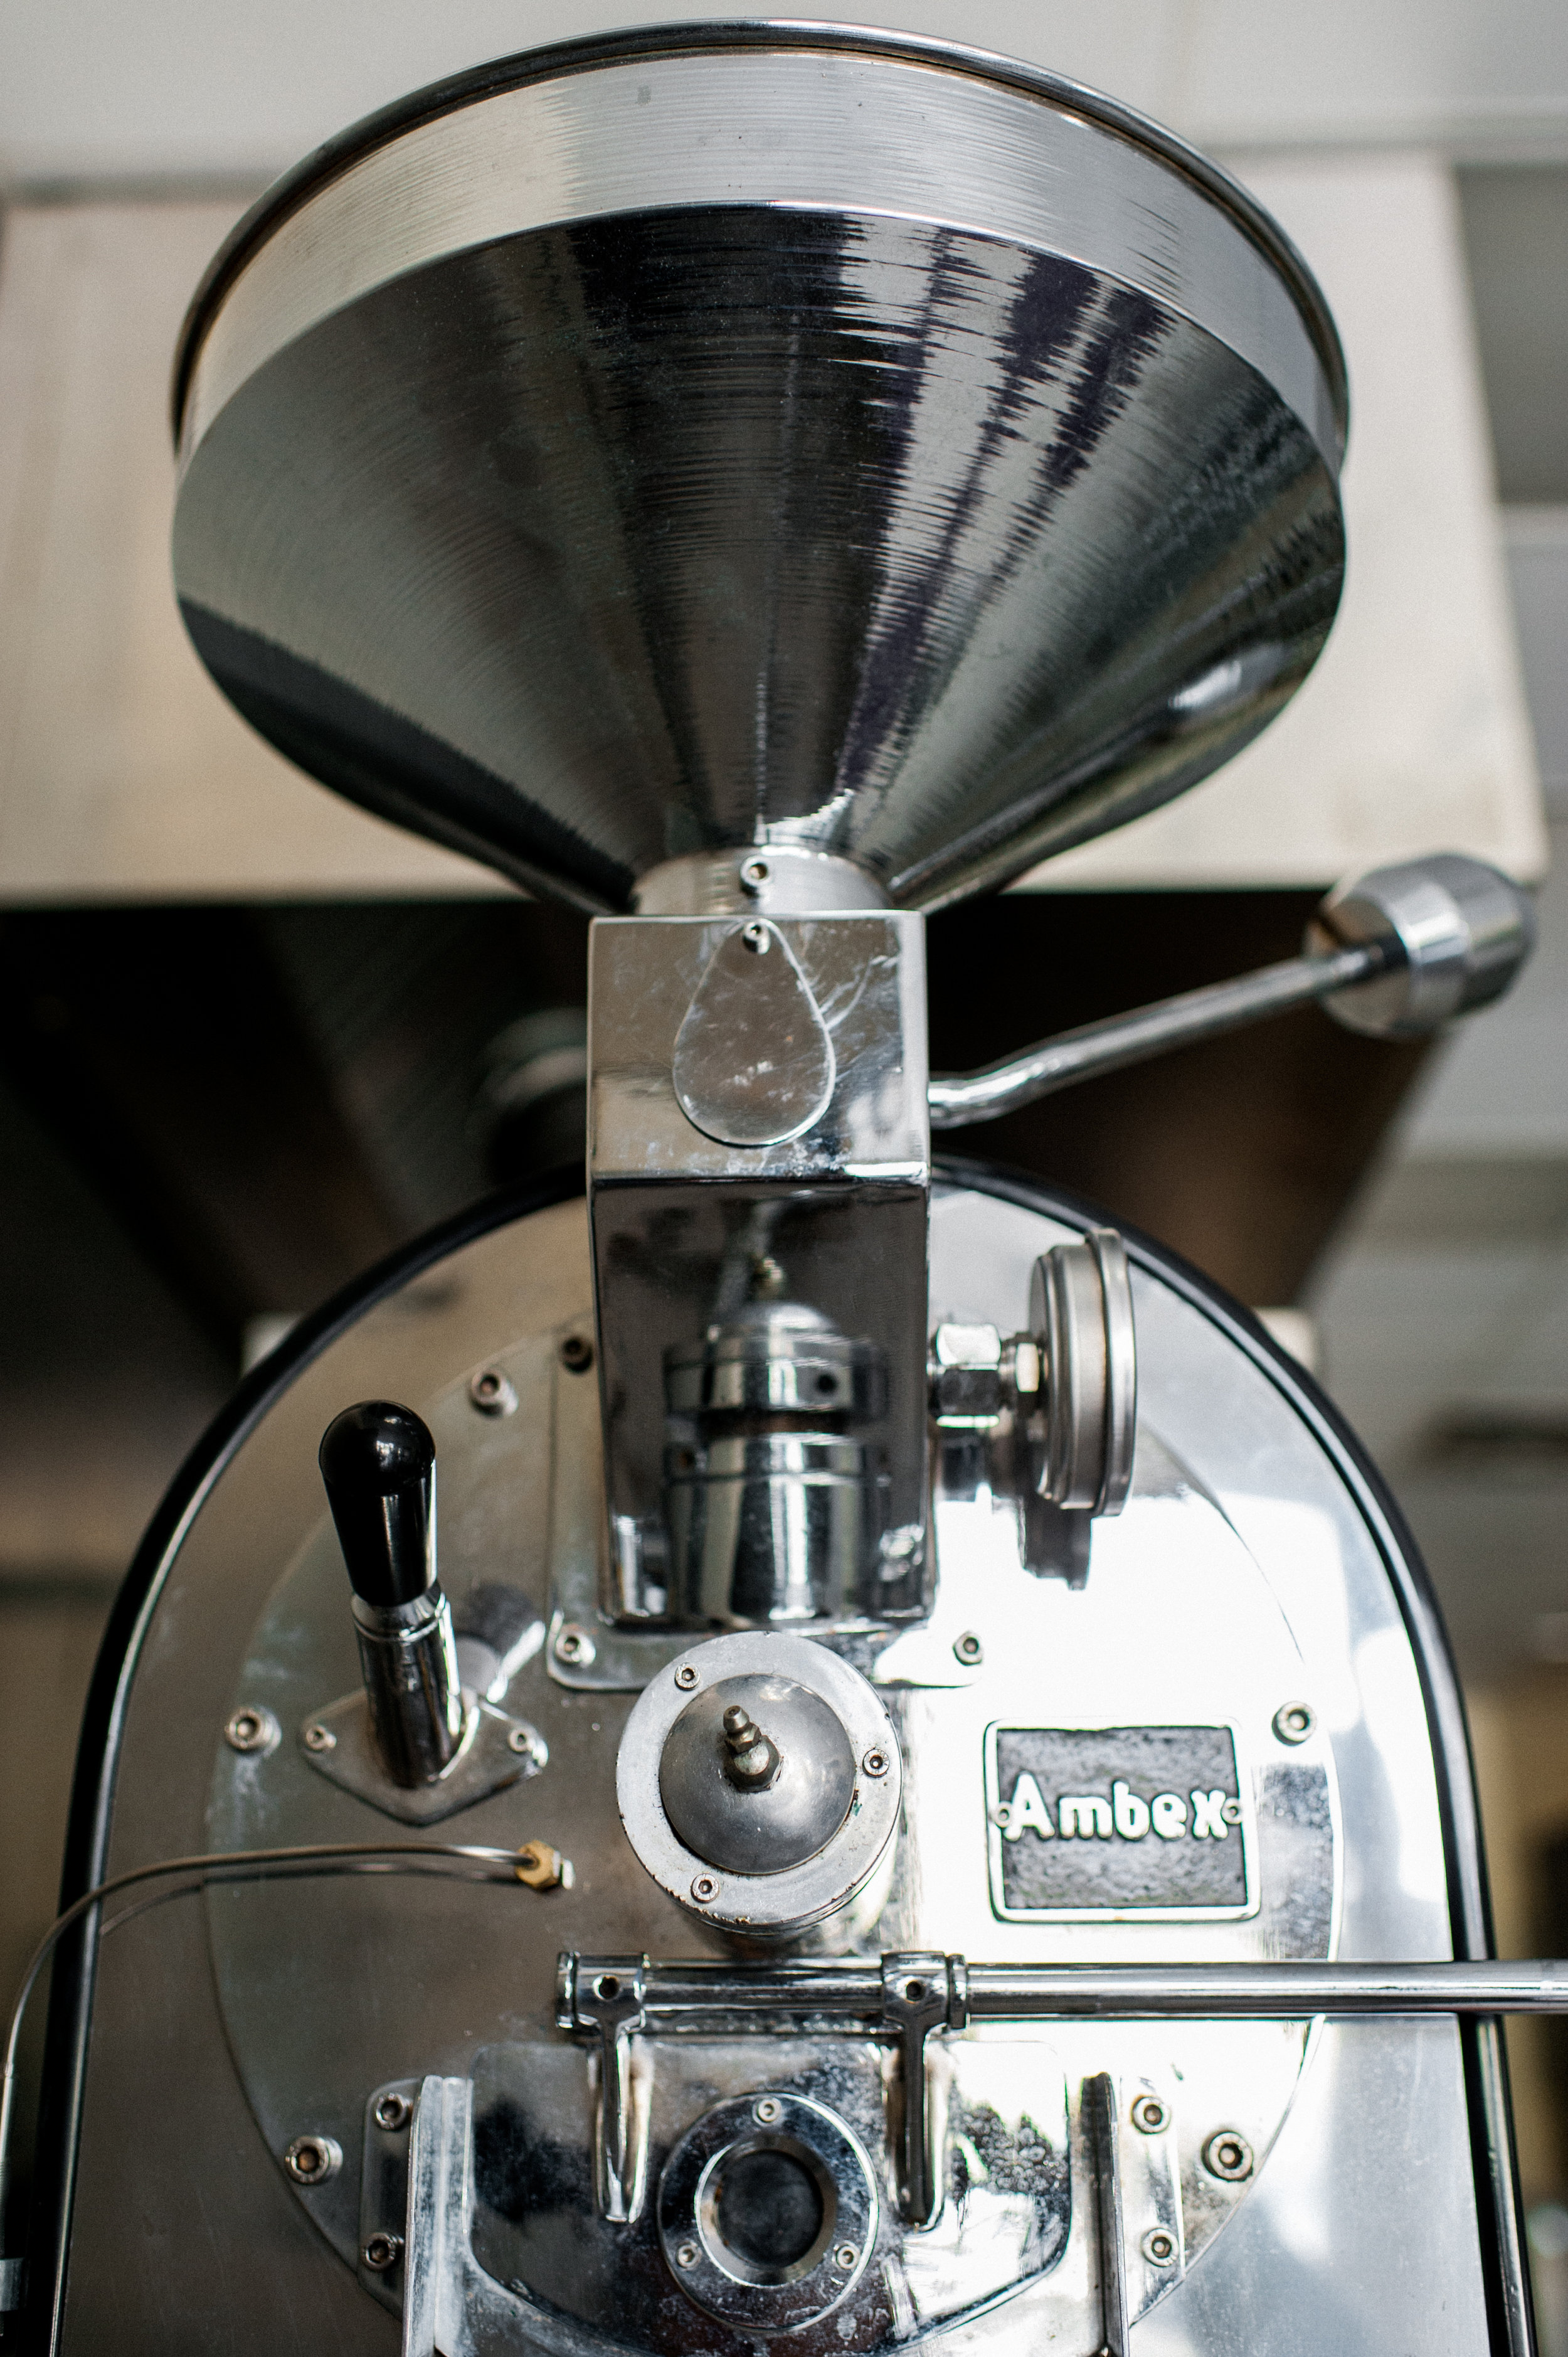 AmbexYM5_CoffeeRoaster_RebootRoasting_10.jpg